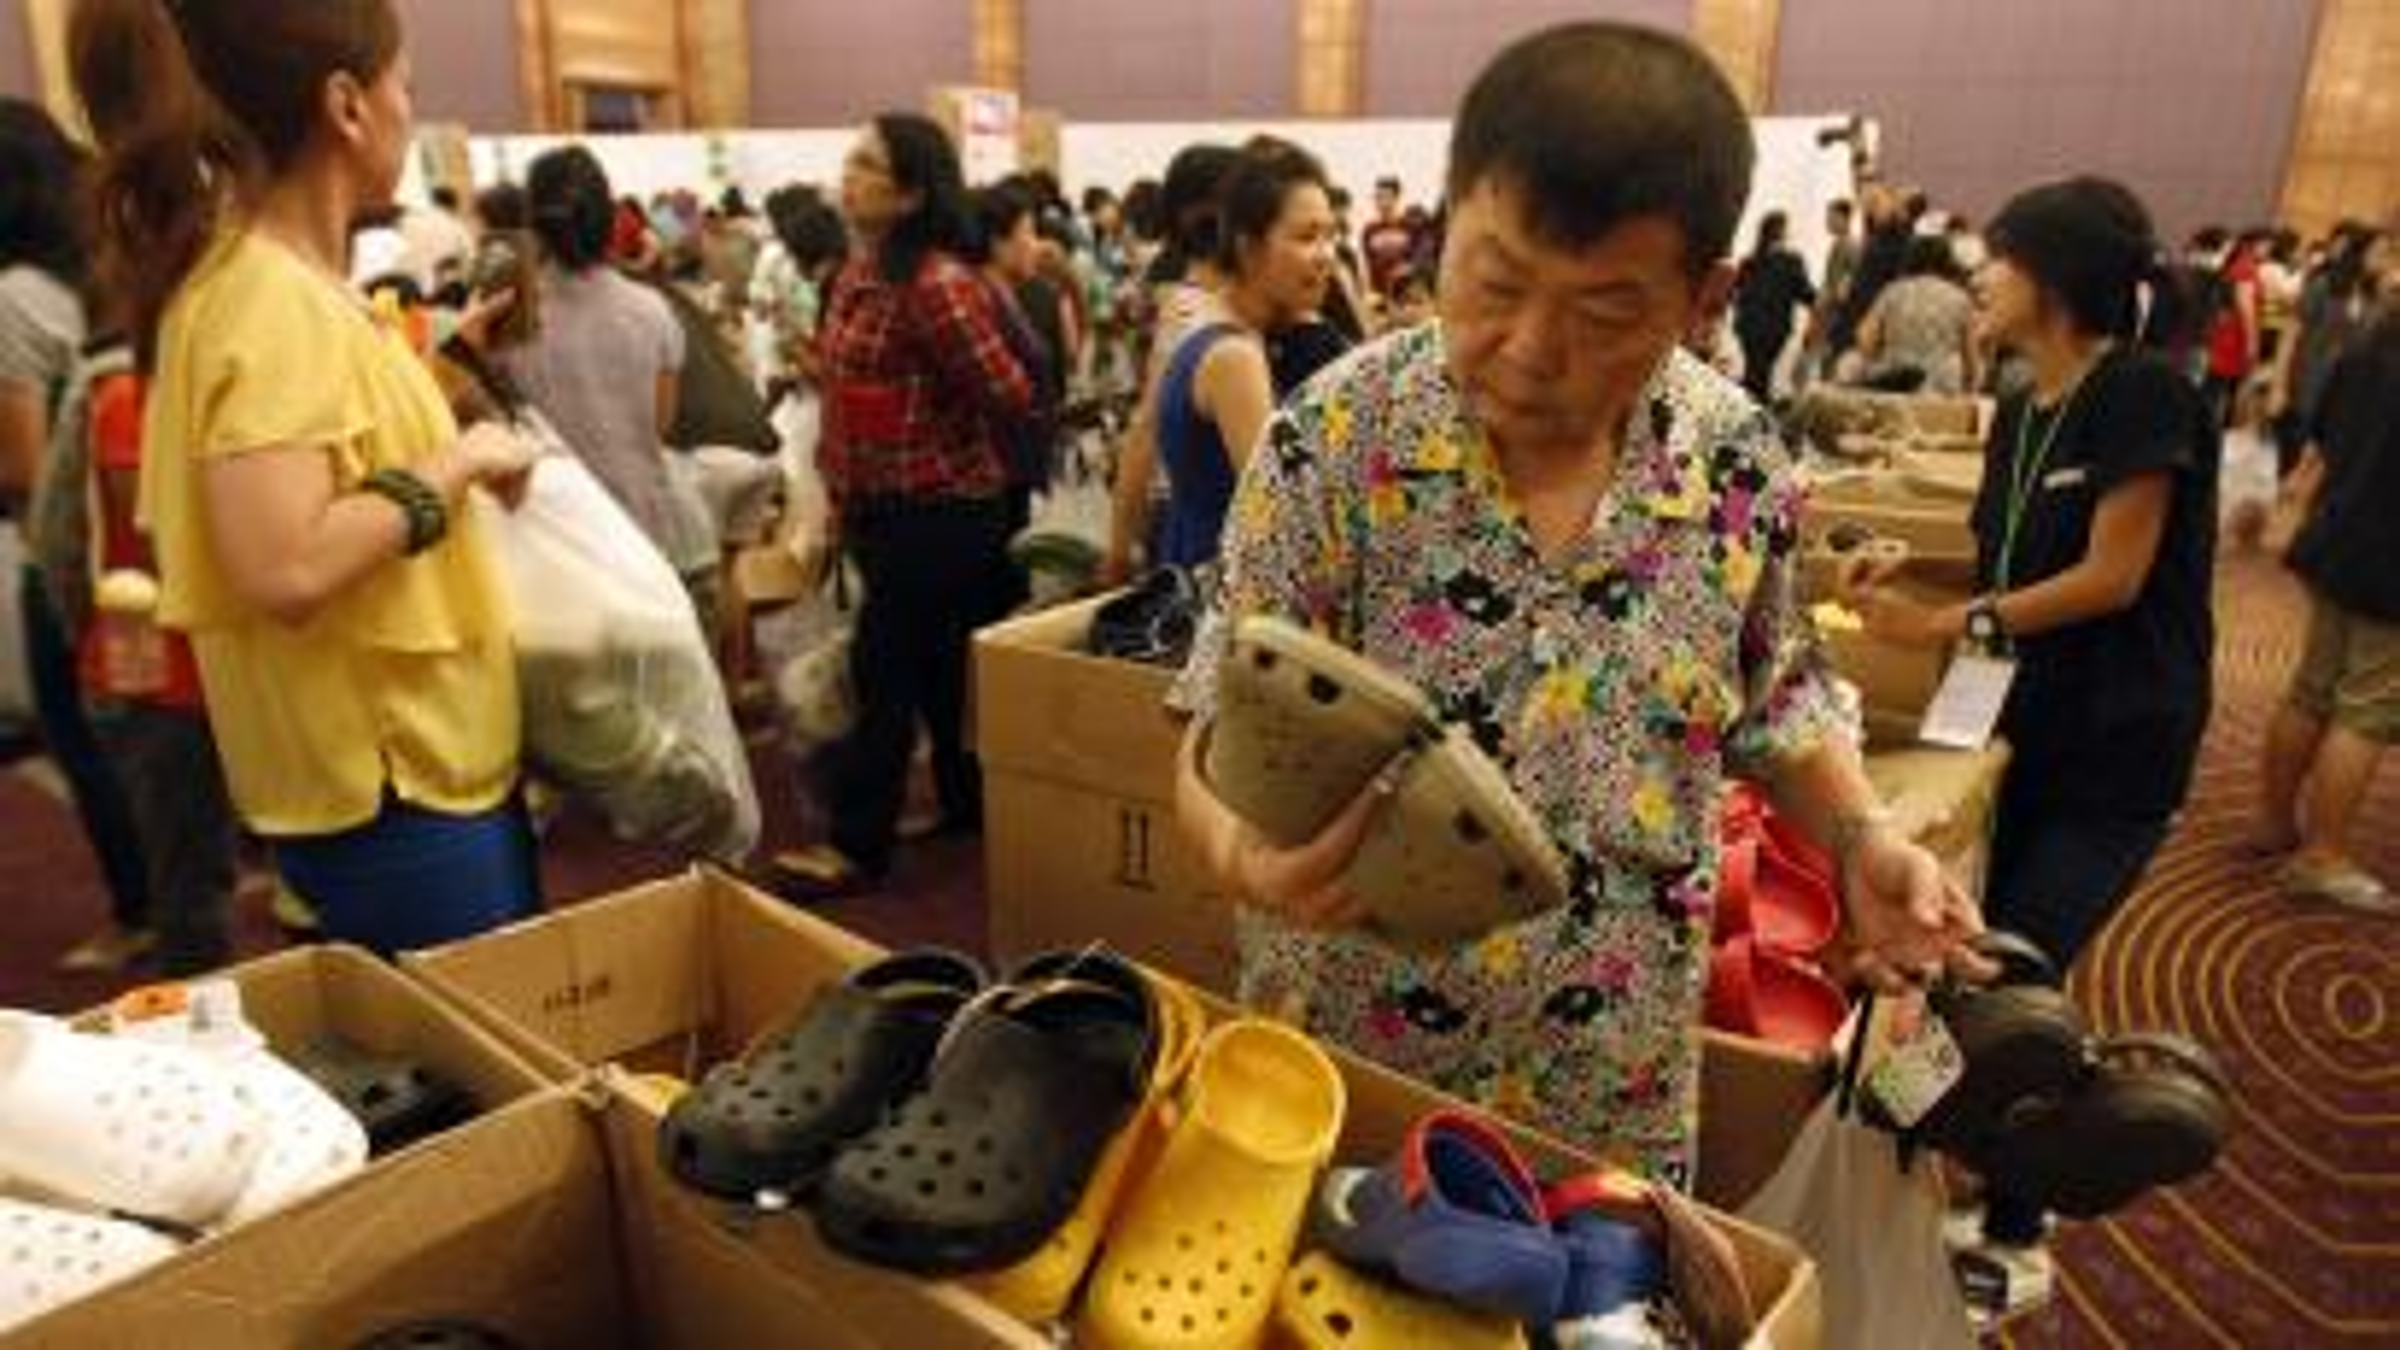 2fb56287a494 Why  200 million won t make Crocs popular again — Quartz